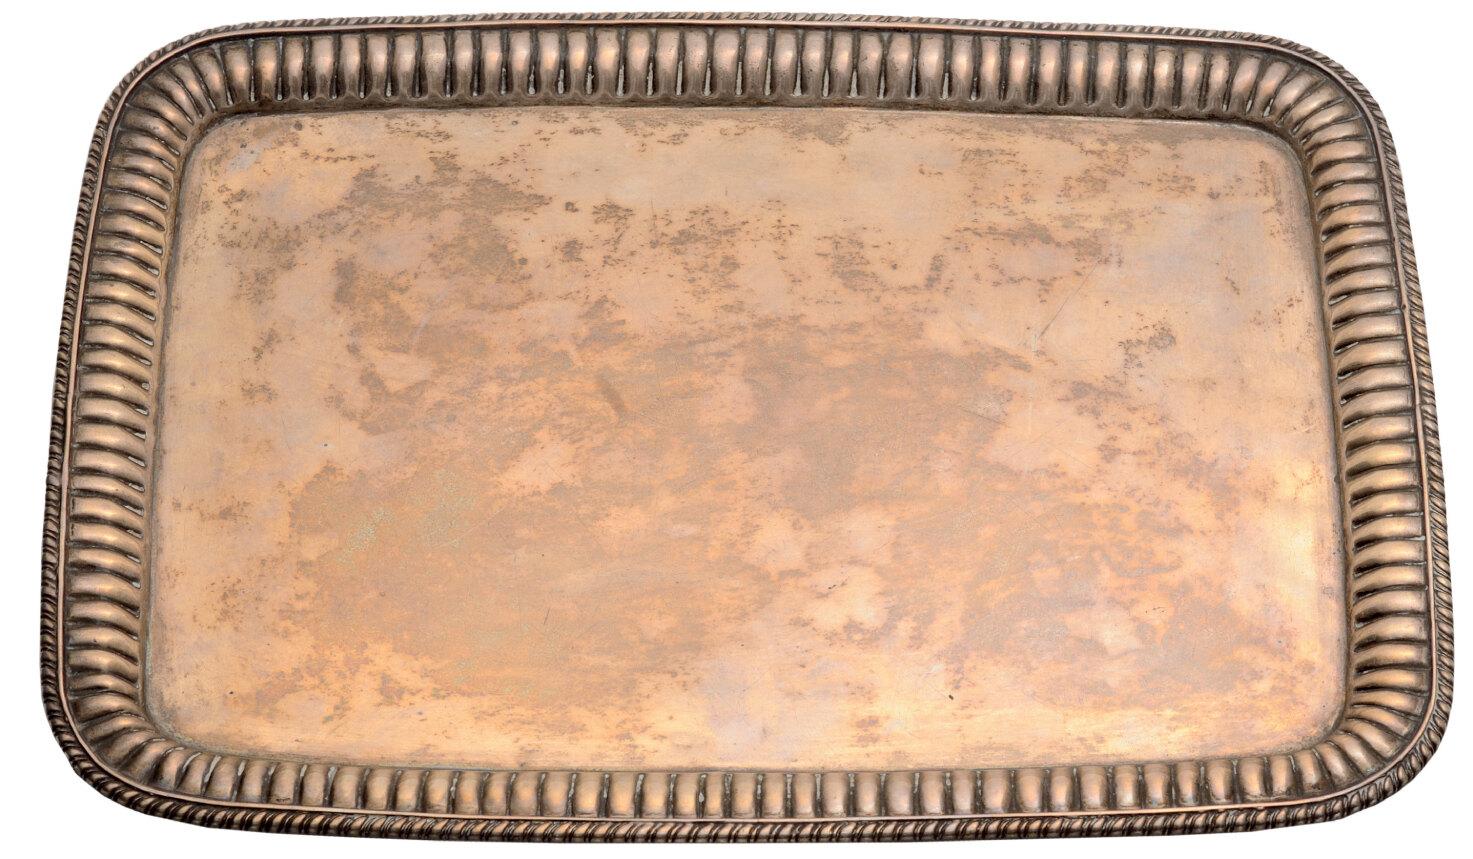 Lot 3600 - Rectangular silver service tray